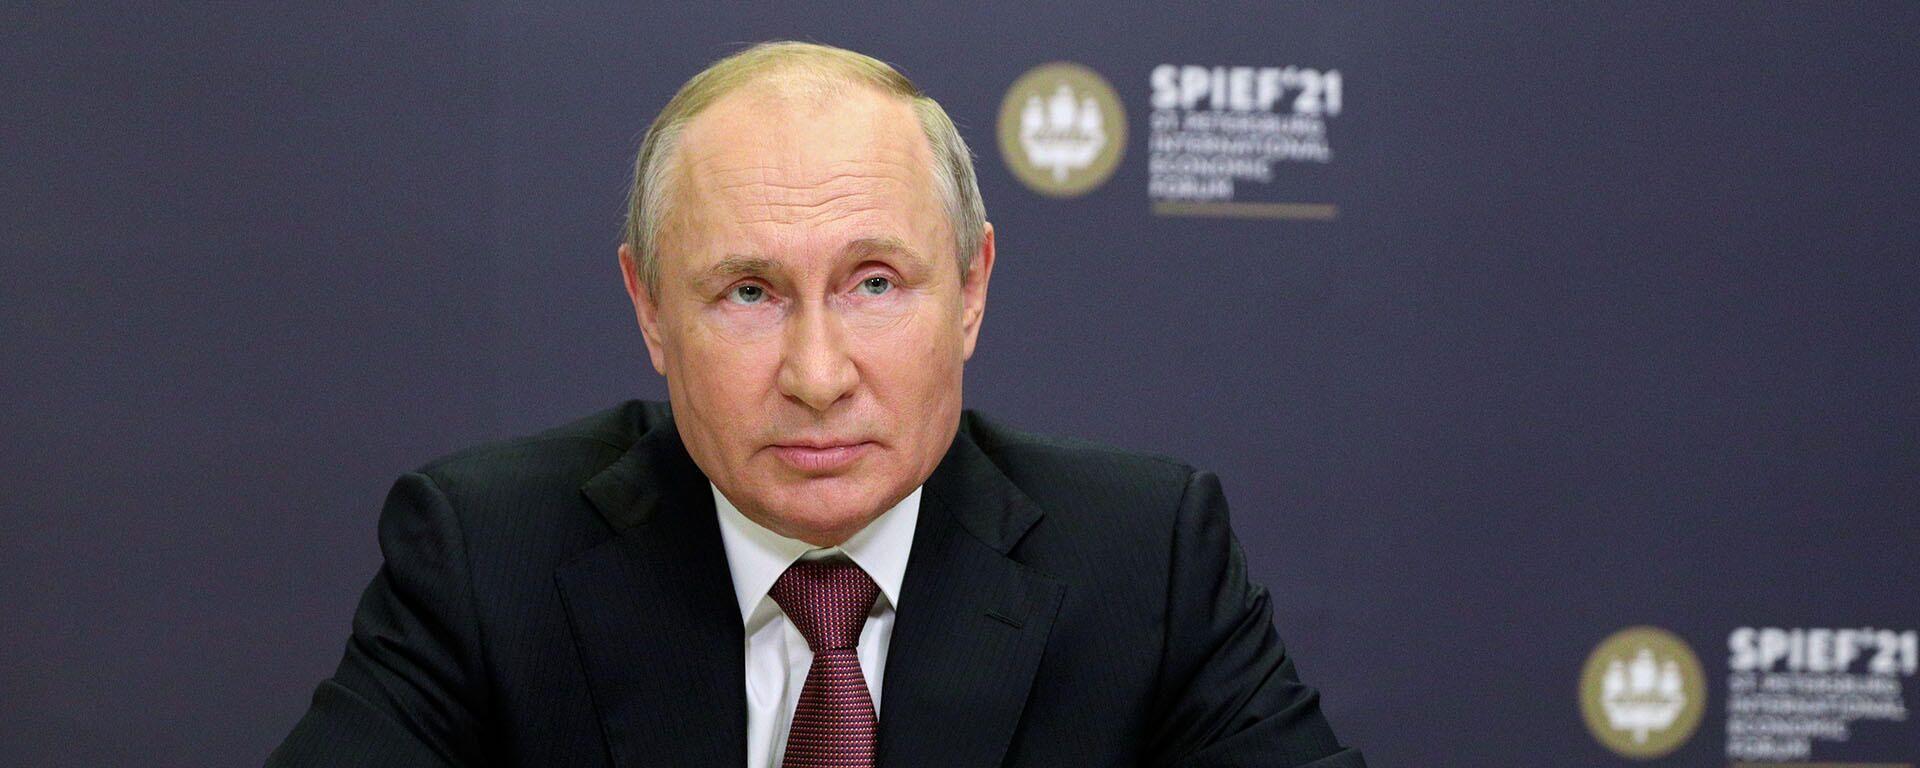 Путин заступился за российских журналистов за рубежом - Sputnik Latvija, 1920, 09.06.2021